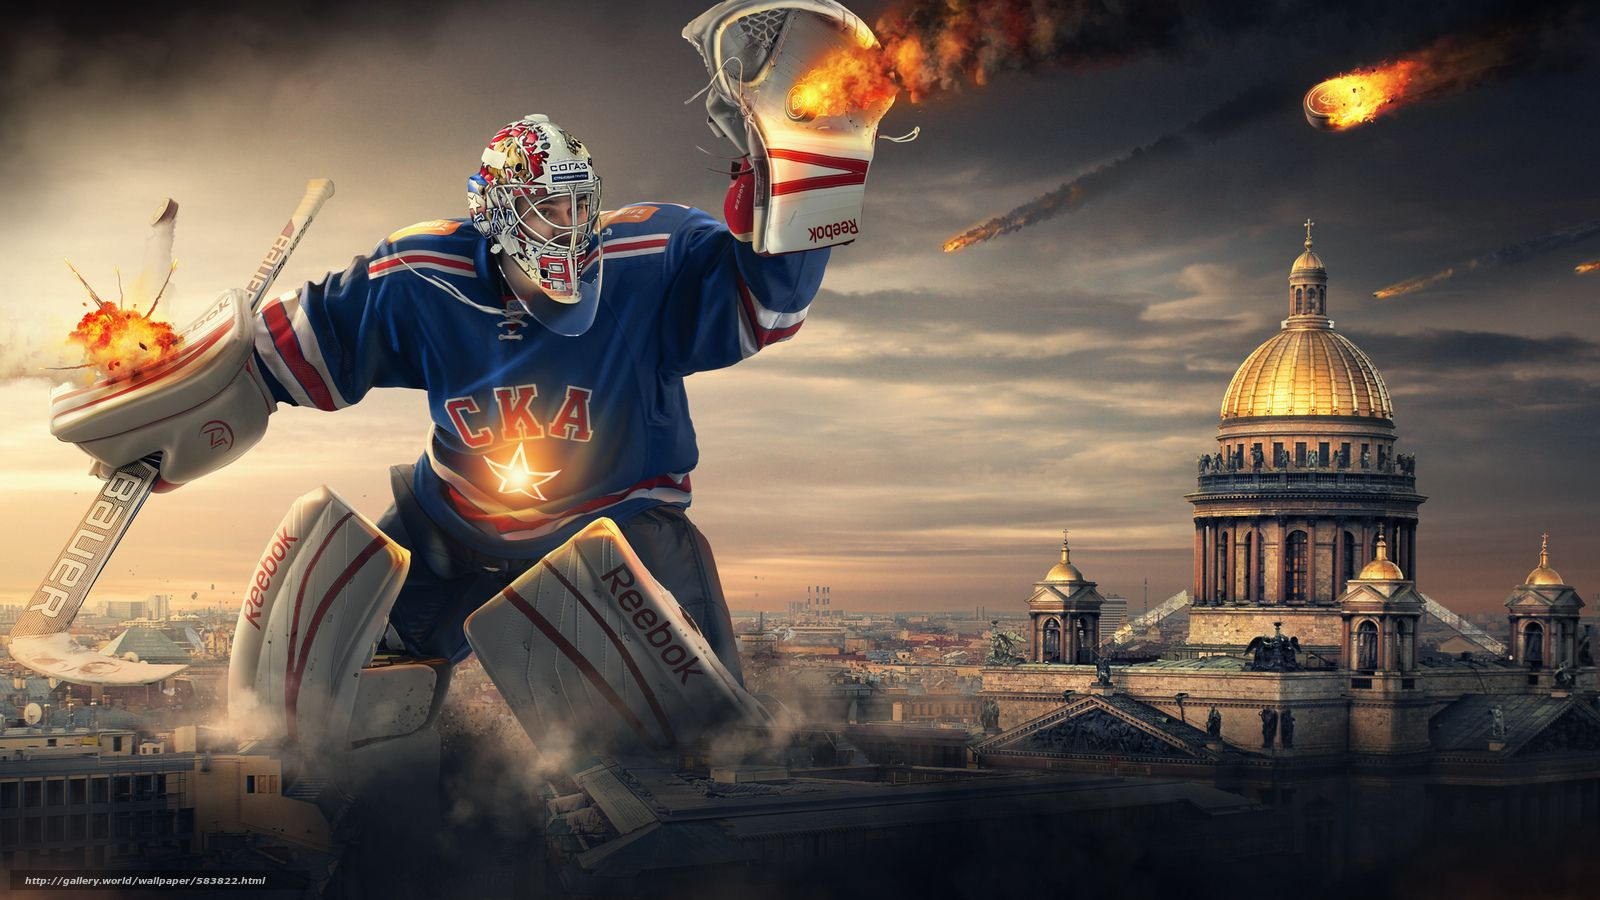 Hockey Goalie Wallpaper Google Suche Fondos De Pantalla